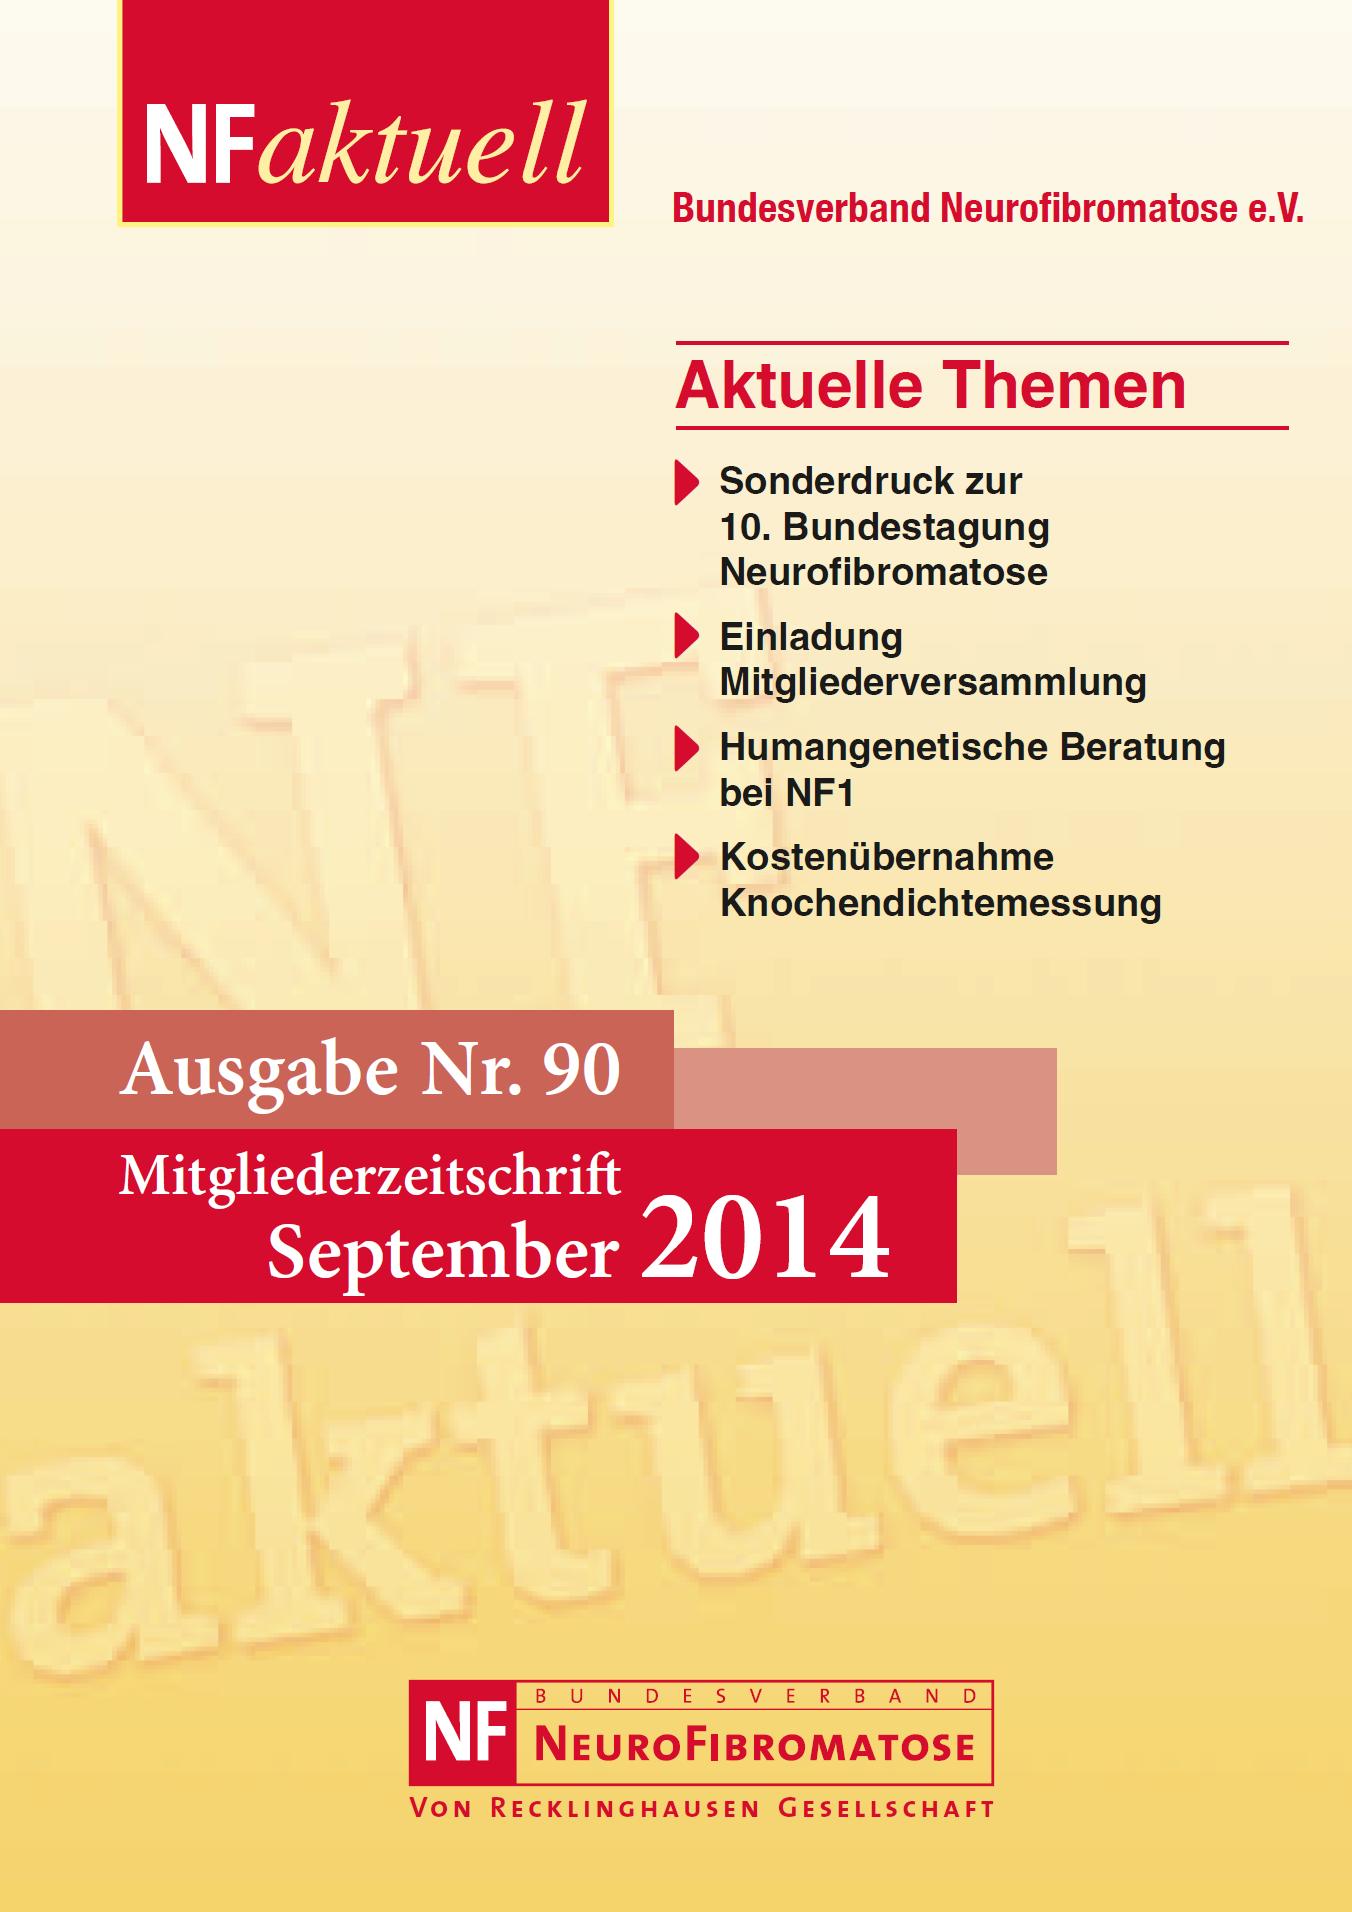 NFaktuell-90-september-2014-titel